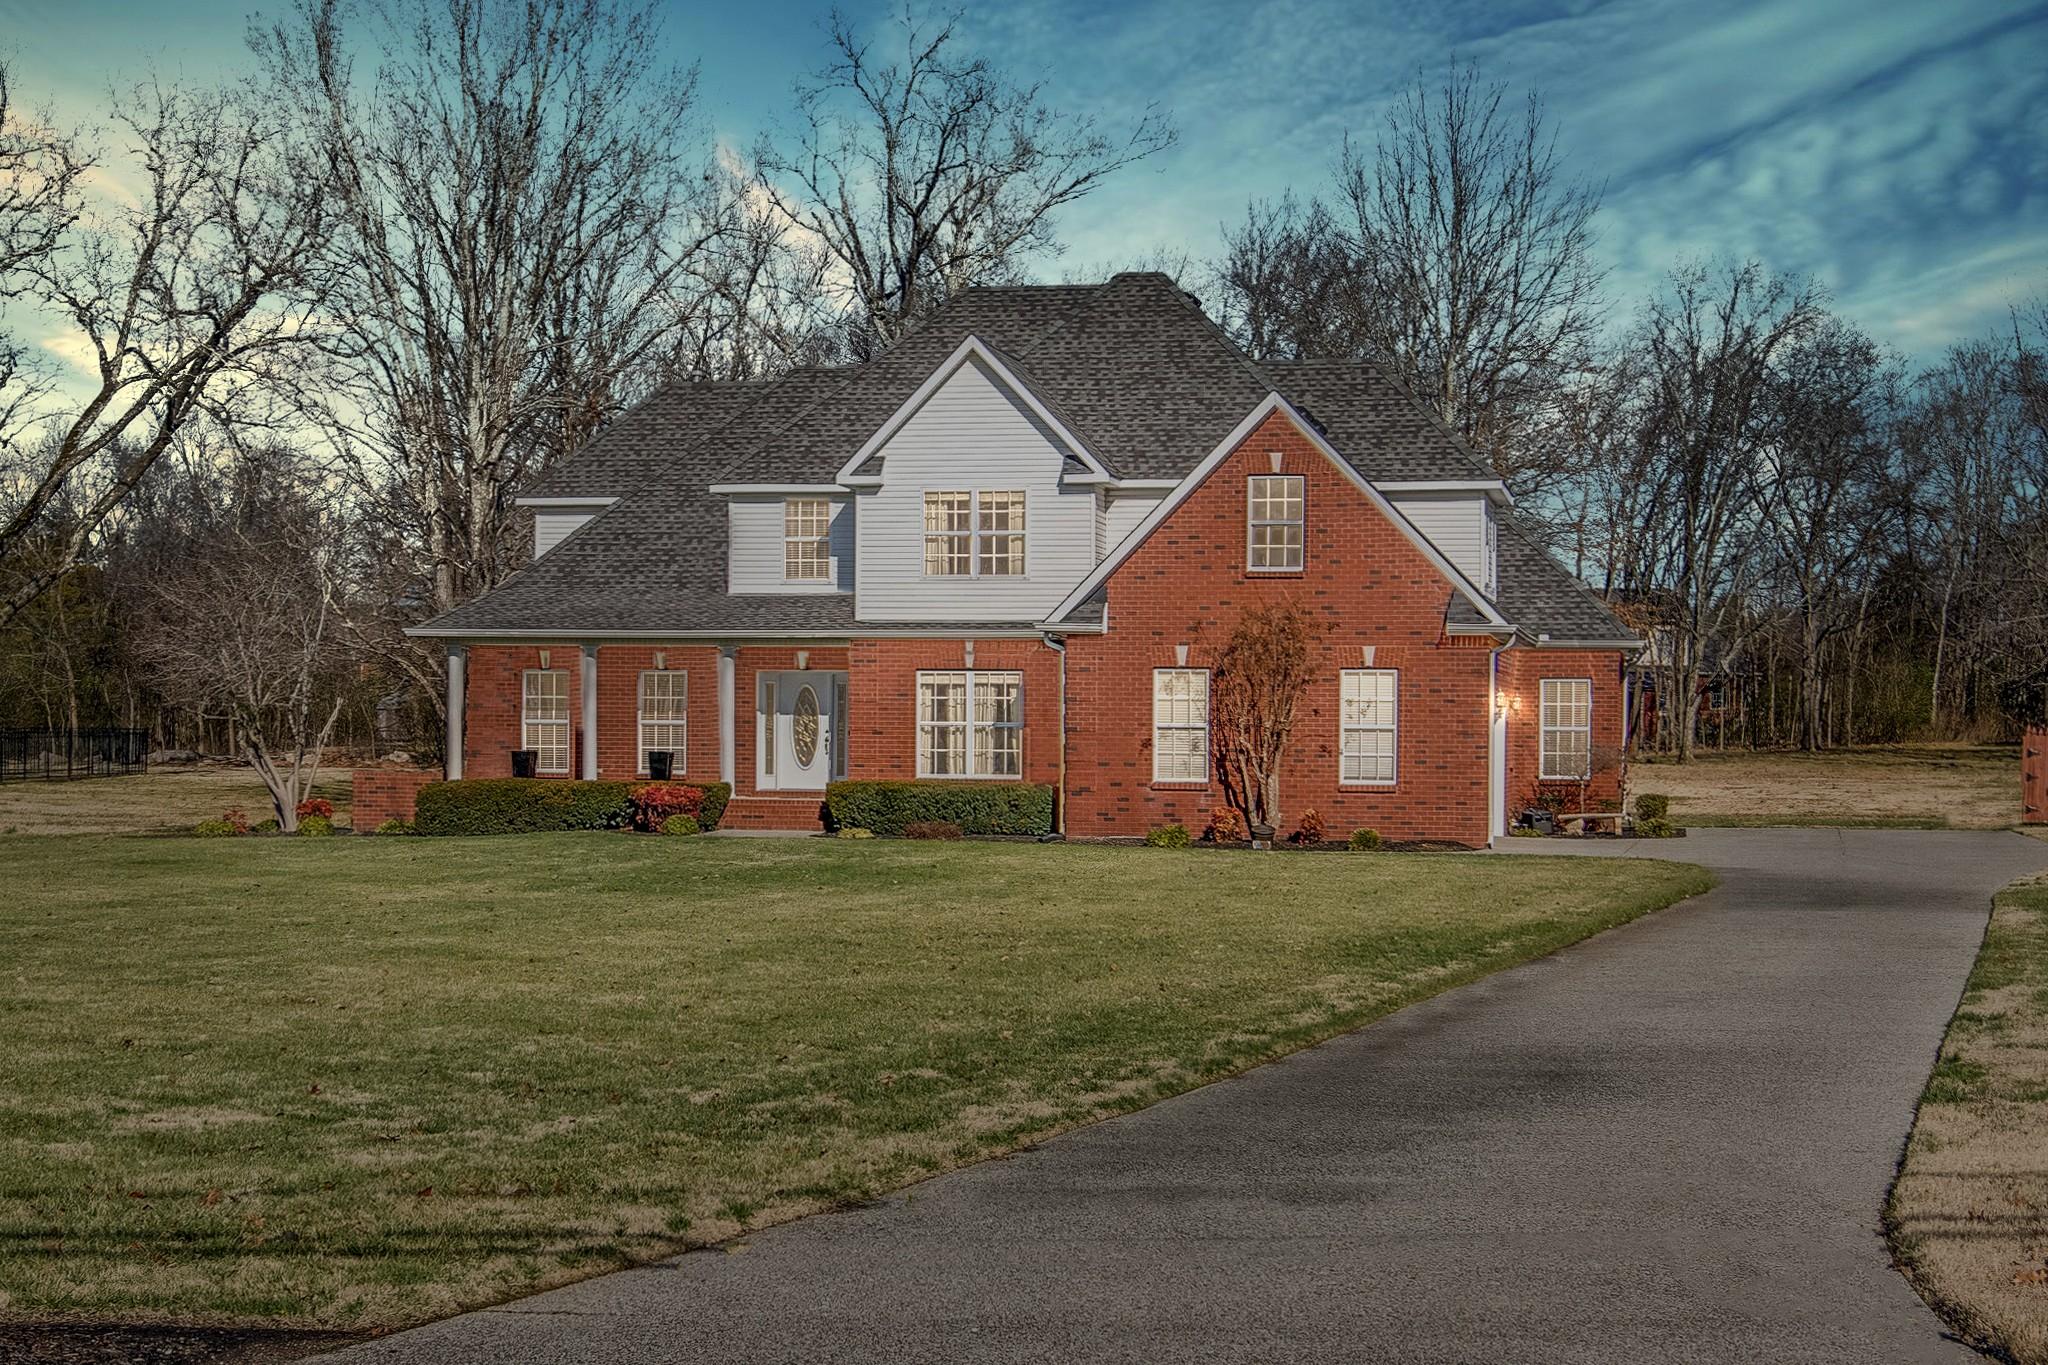 6554 Franklin Rd, Murfreesboro, TN 37128 - Murfreesboro, TN real estate listing